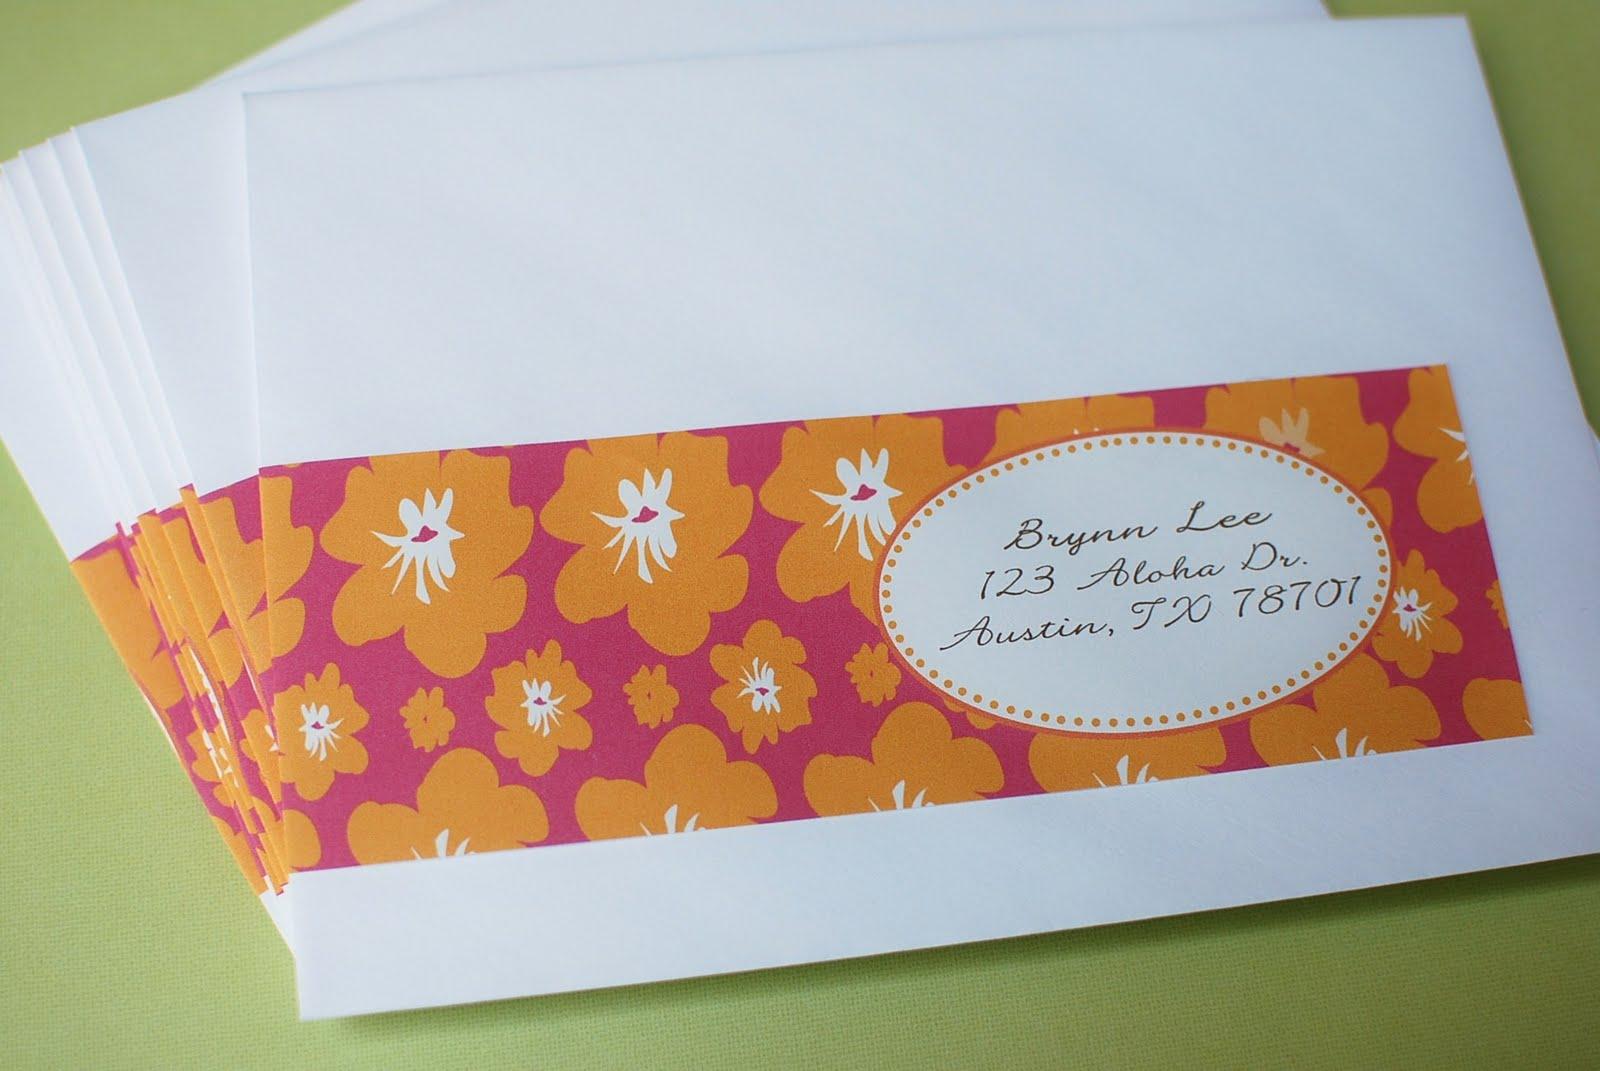 Galerry envelope design ideas